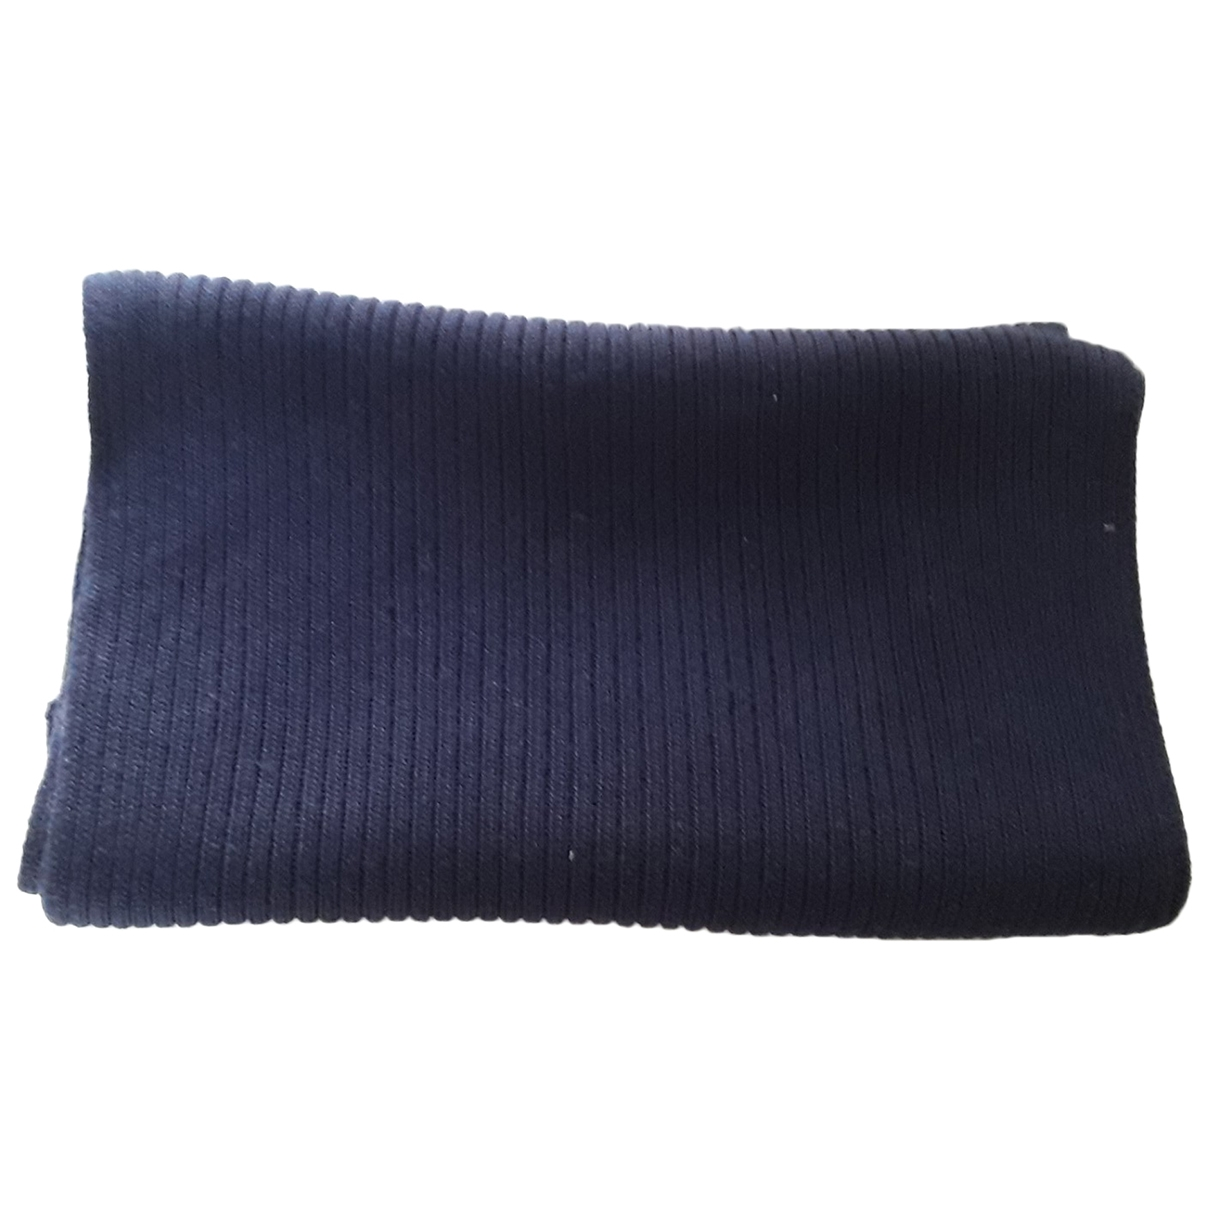 Prada \N Navy Wool scarf & pocket squares for Men \N